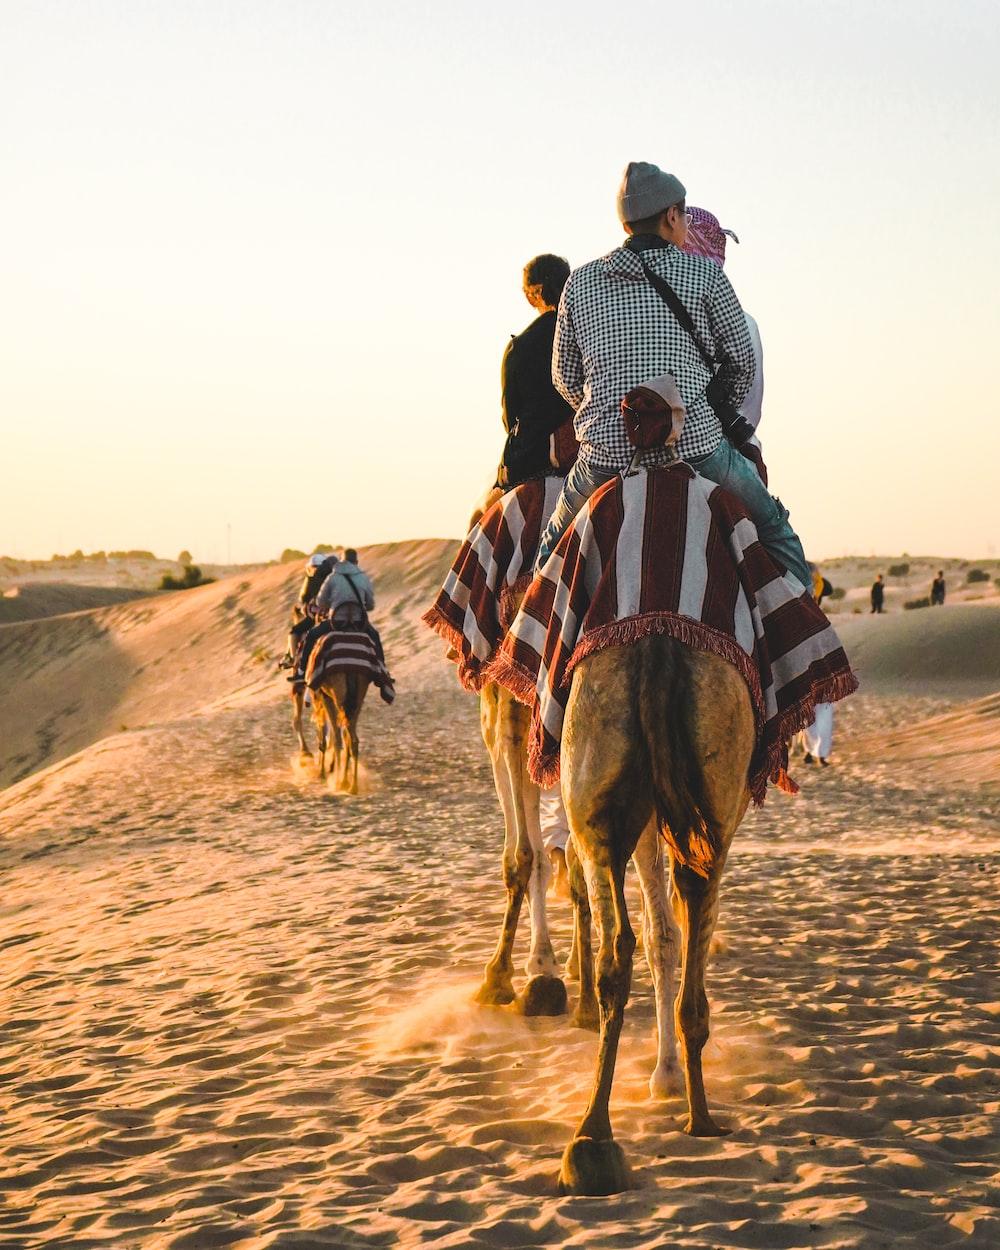 people riding camel at Sahara desert